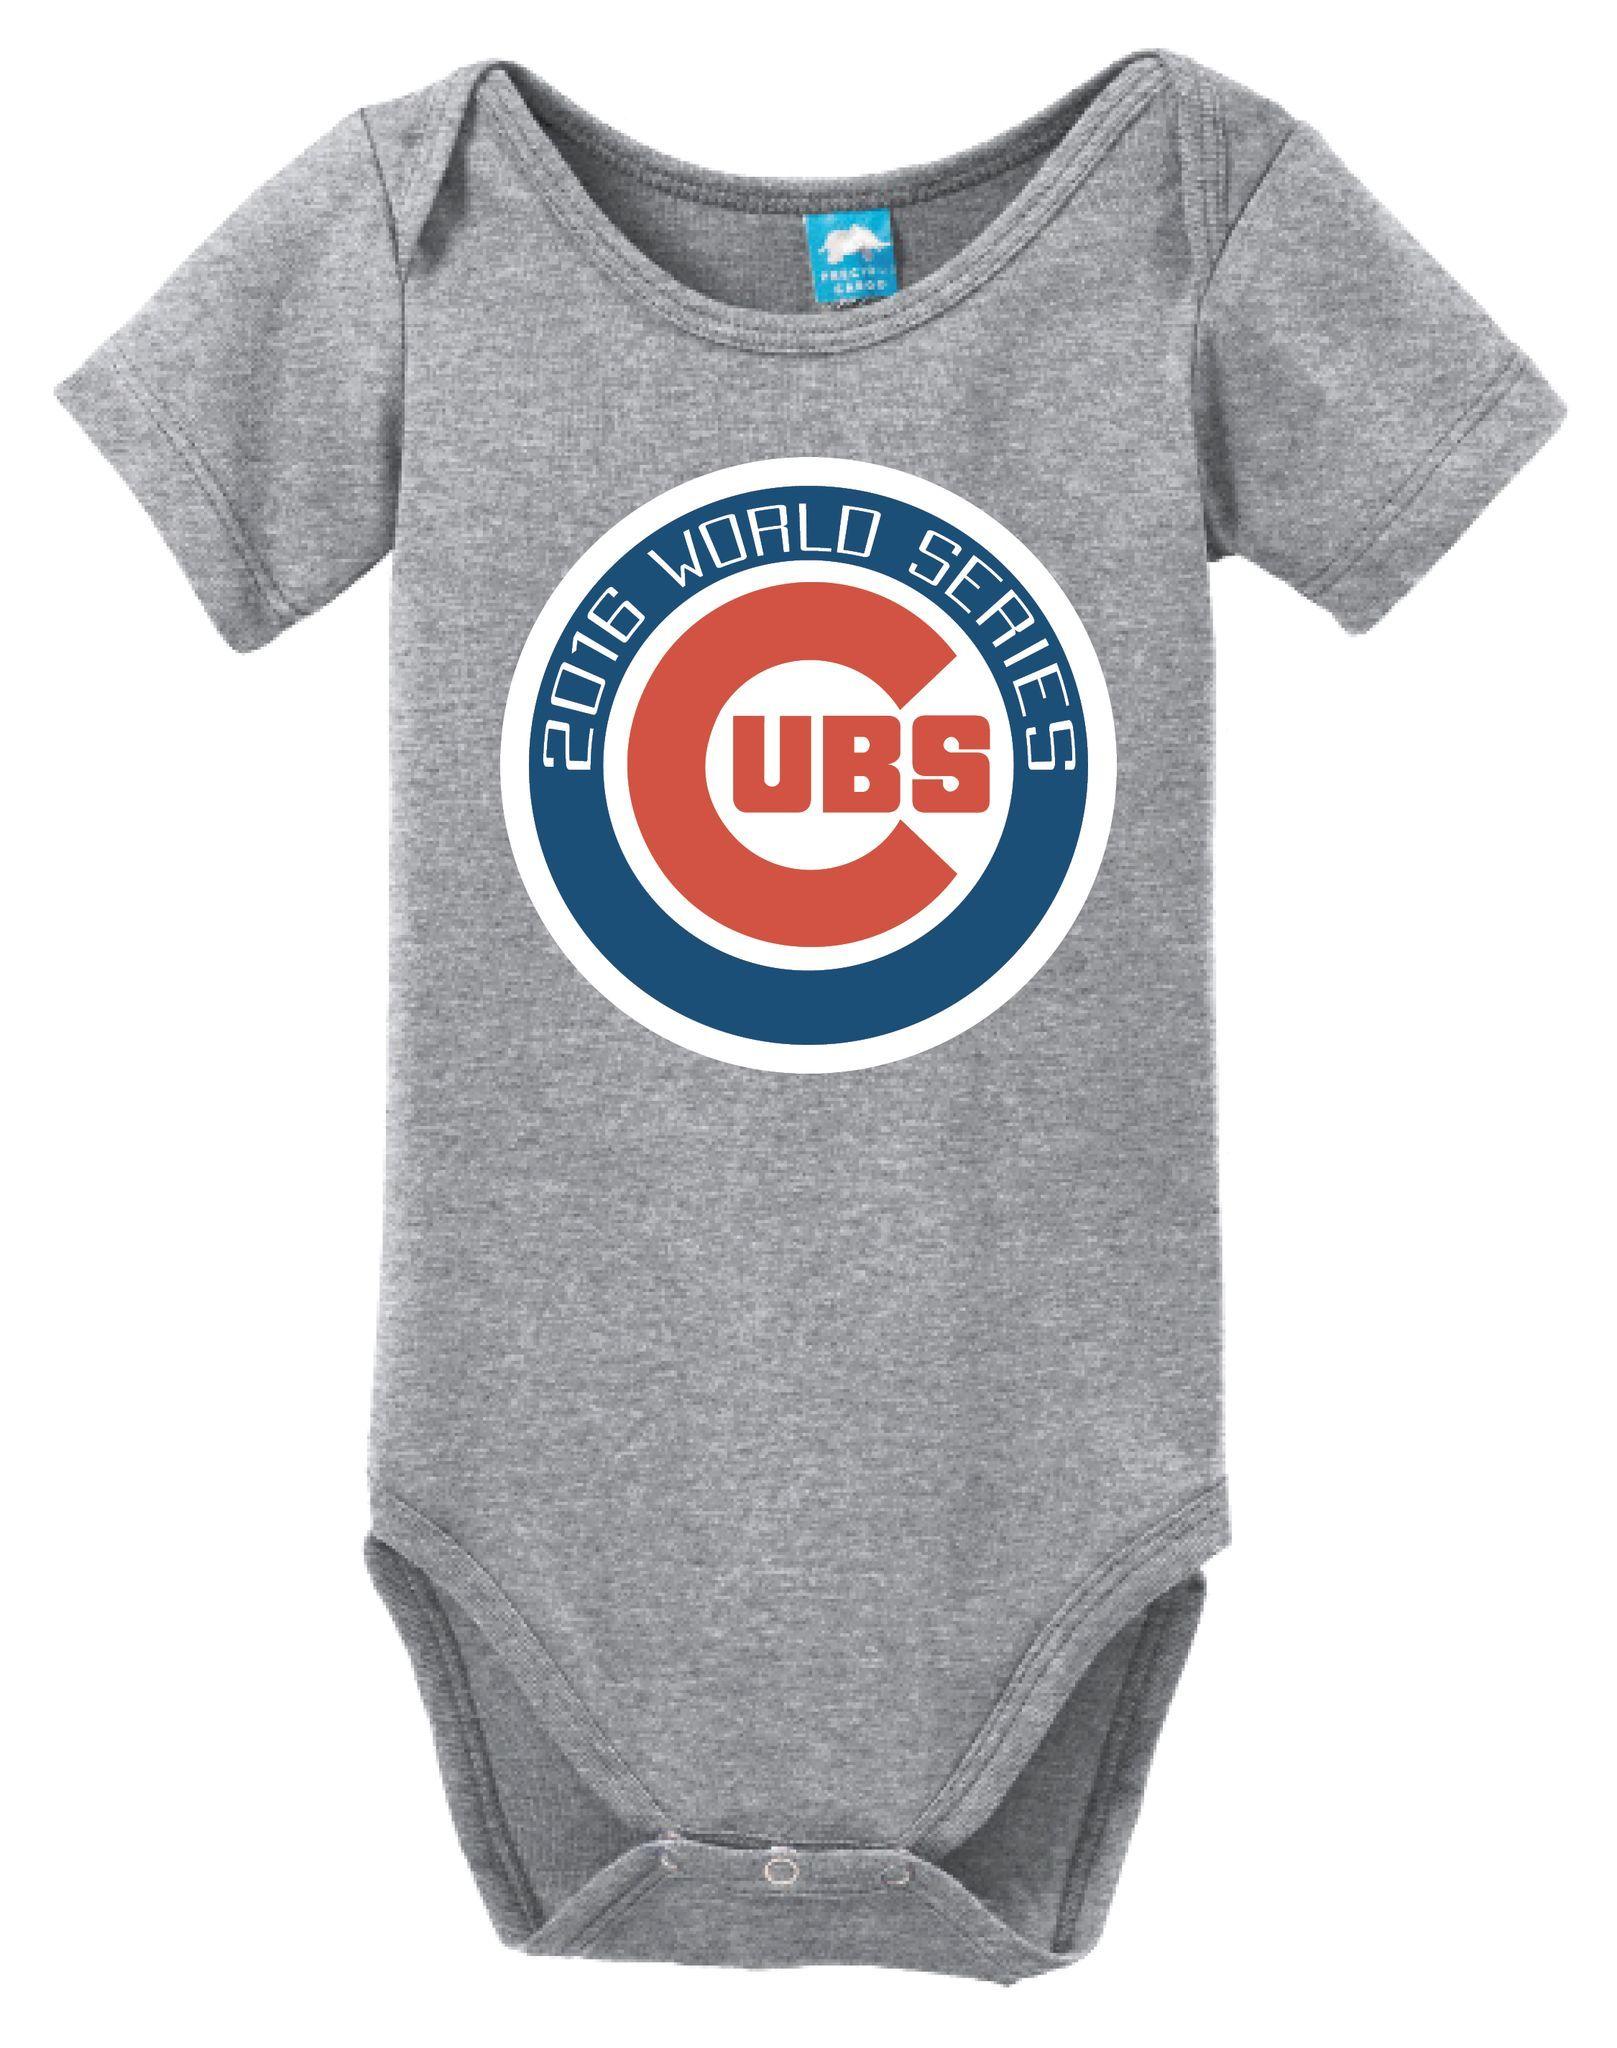 Chicago Cubs World Series Onesie Funny Bodysuit Baby Romper